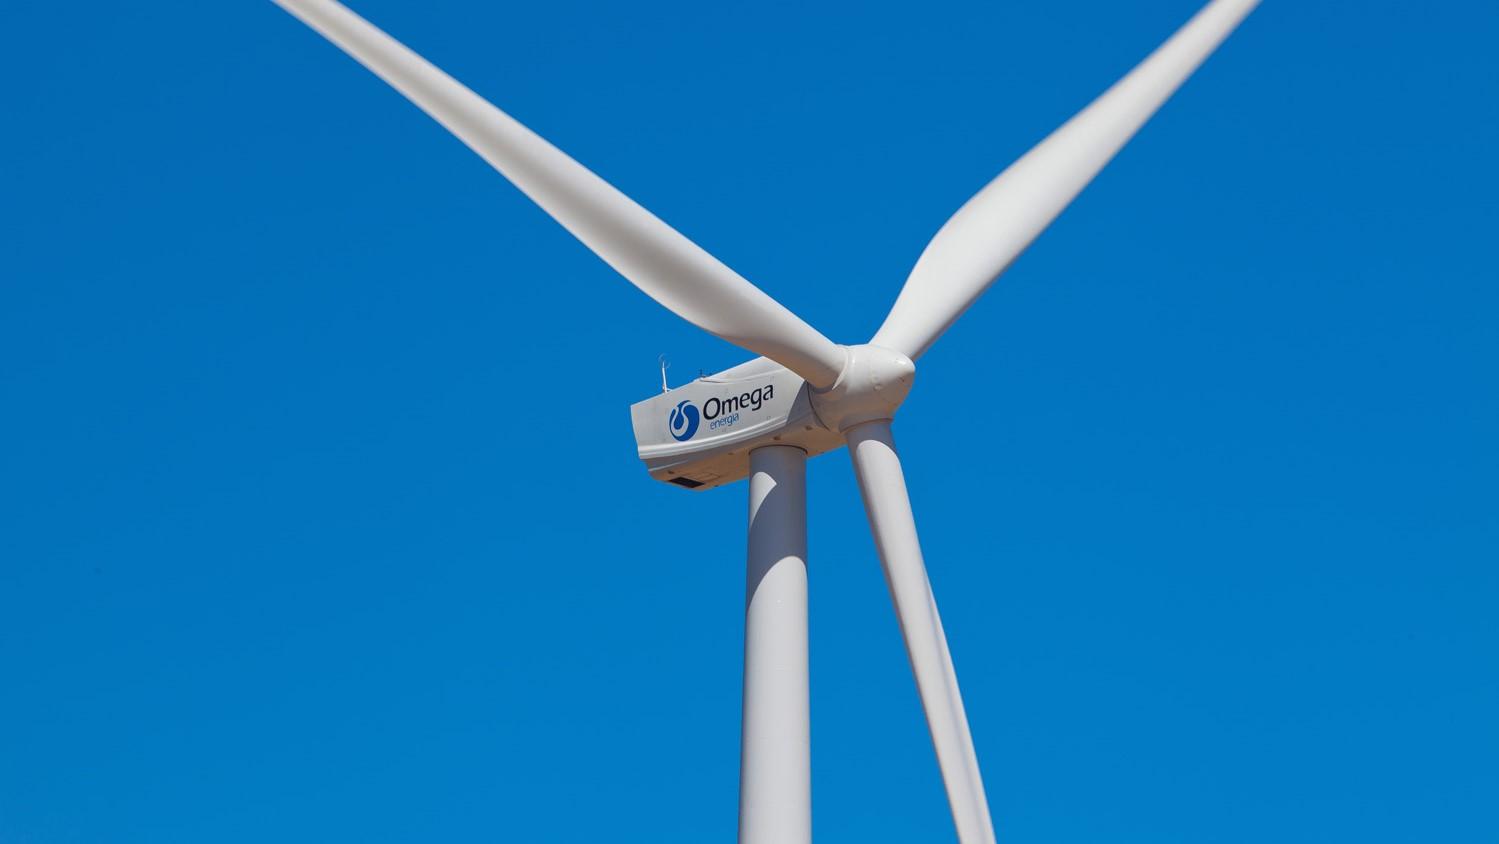 Turbina de vento da omega energia